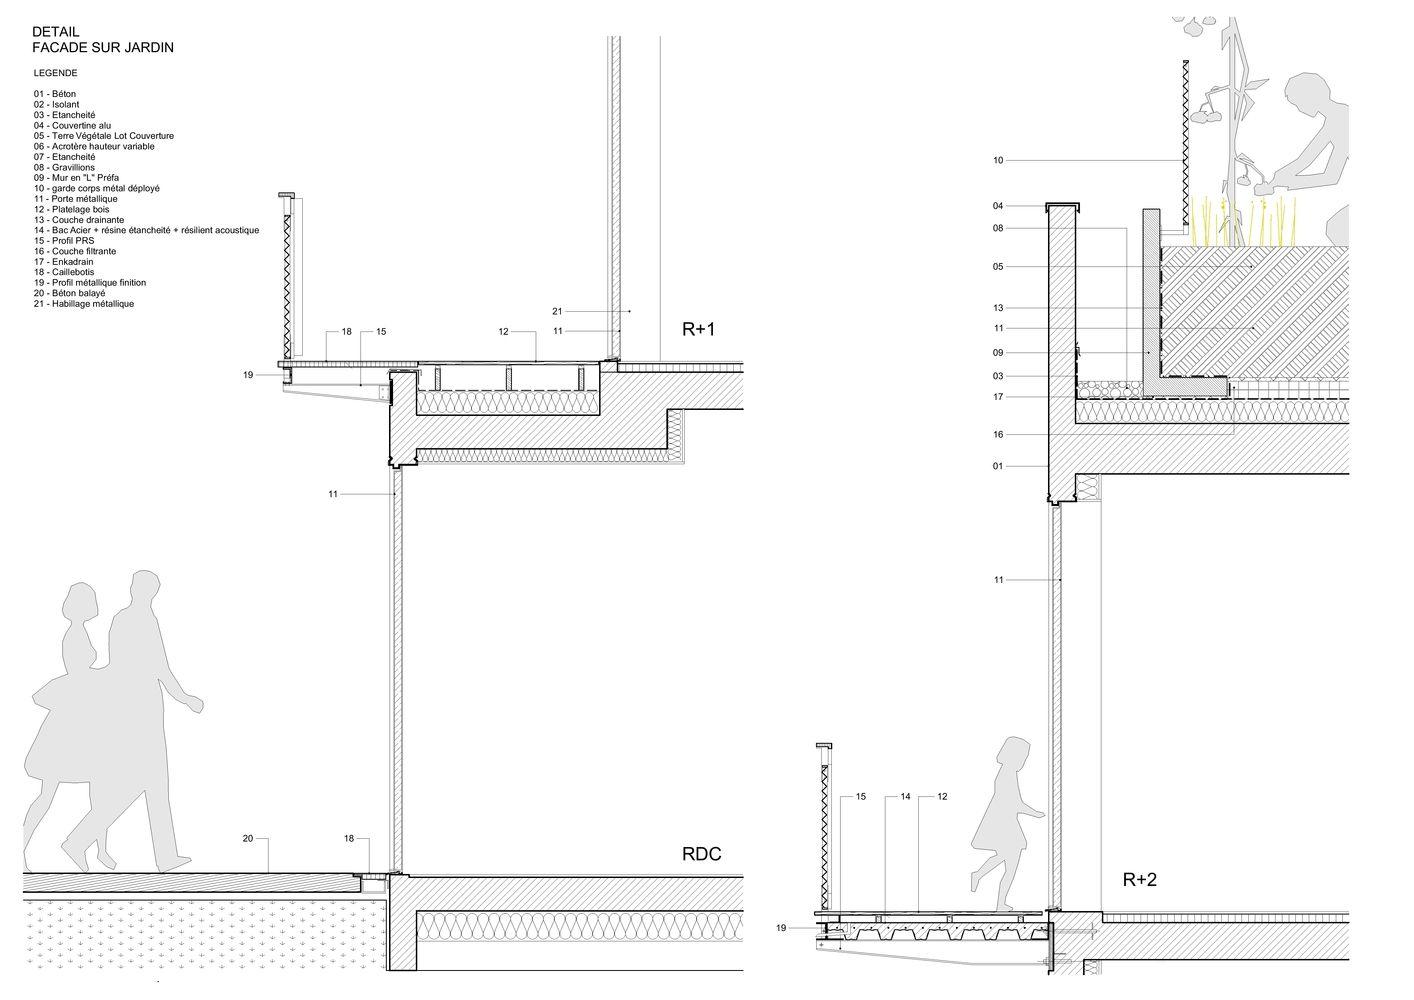 Gallery Of Participatory Habitat In Montreuil Nzi Architectes 21 Architecture Details Residential Architecture Habitats